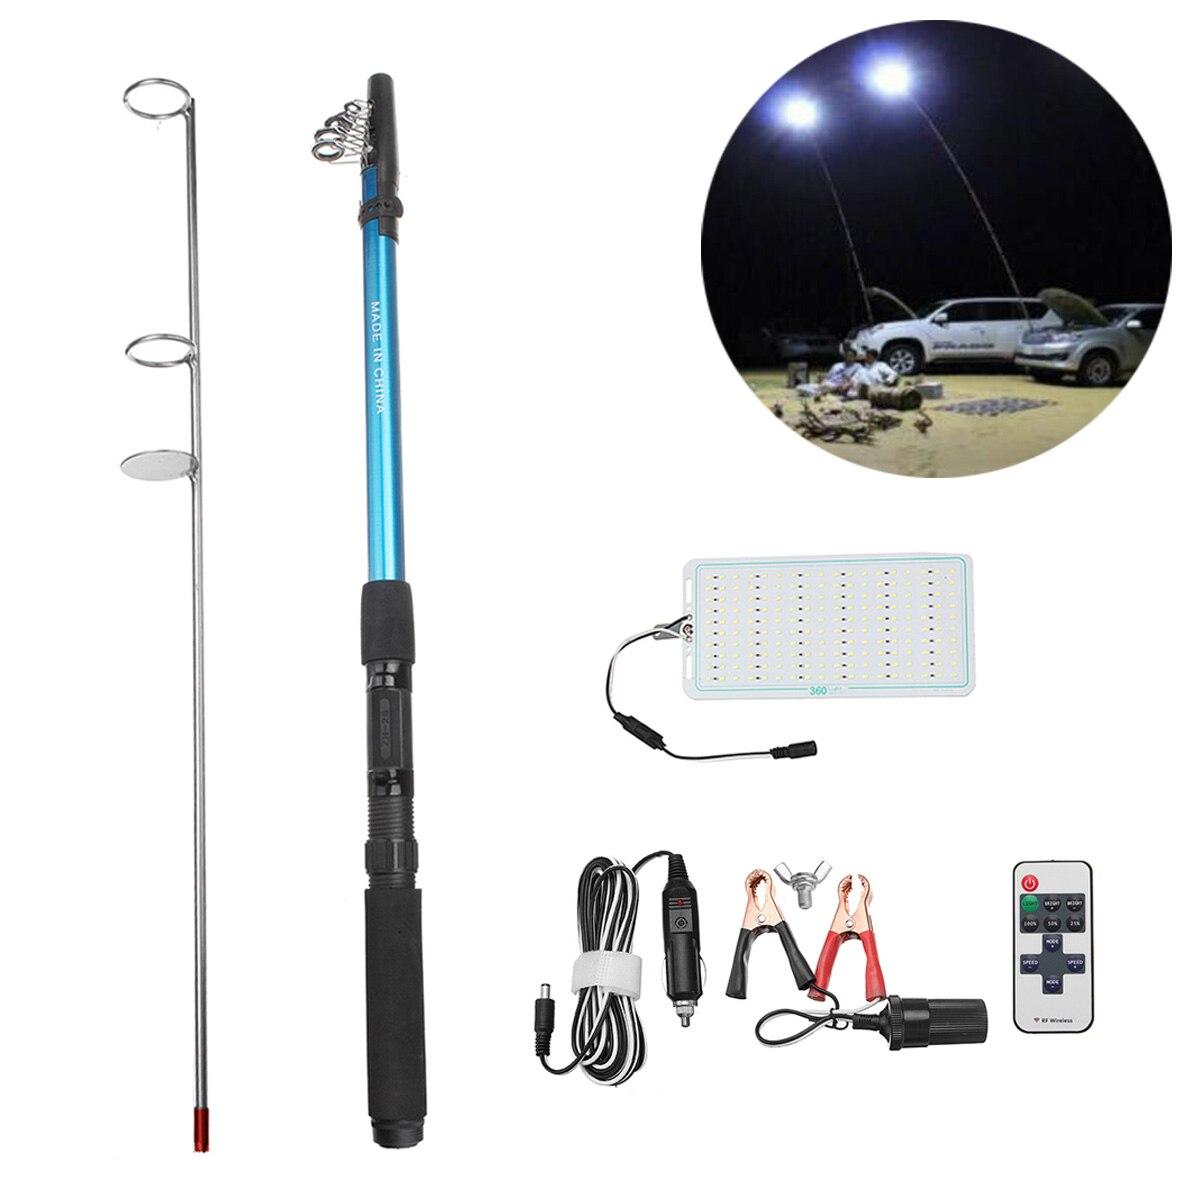 12V 5M 500W Car Rod Light Remote Control Camping Telescope Car Fishing Rod LED Light Lantern Outdoor Lighting Camping Lamp